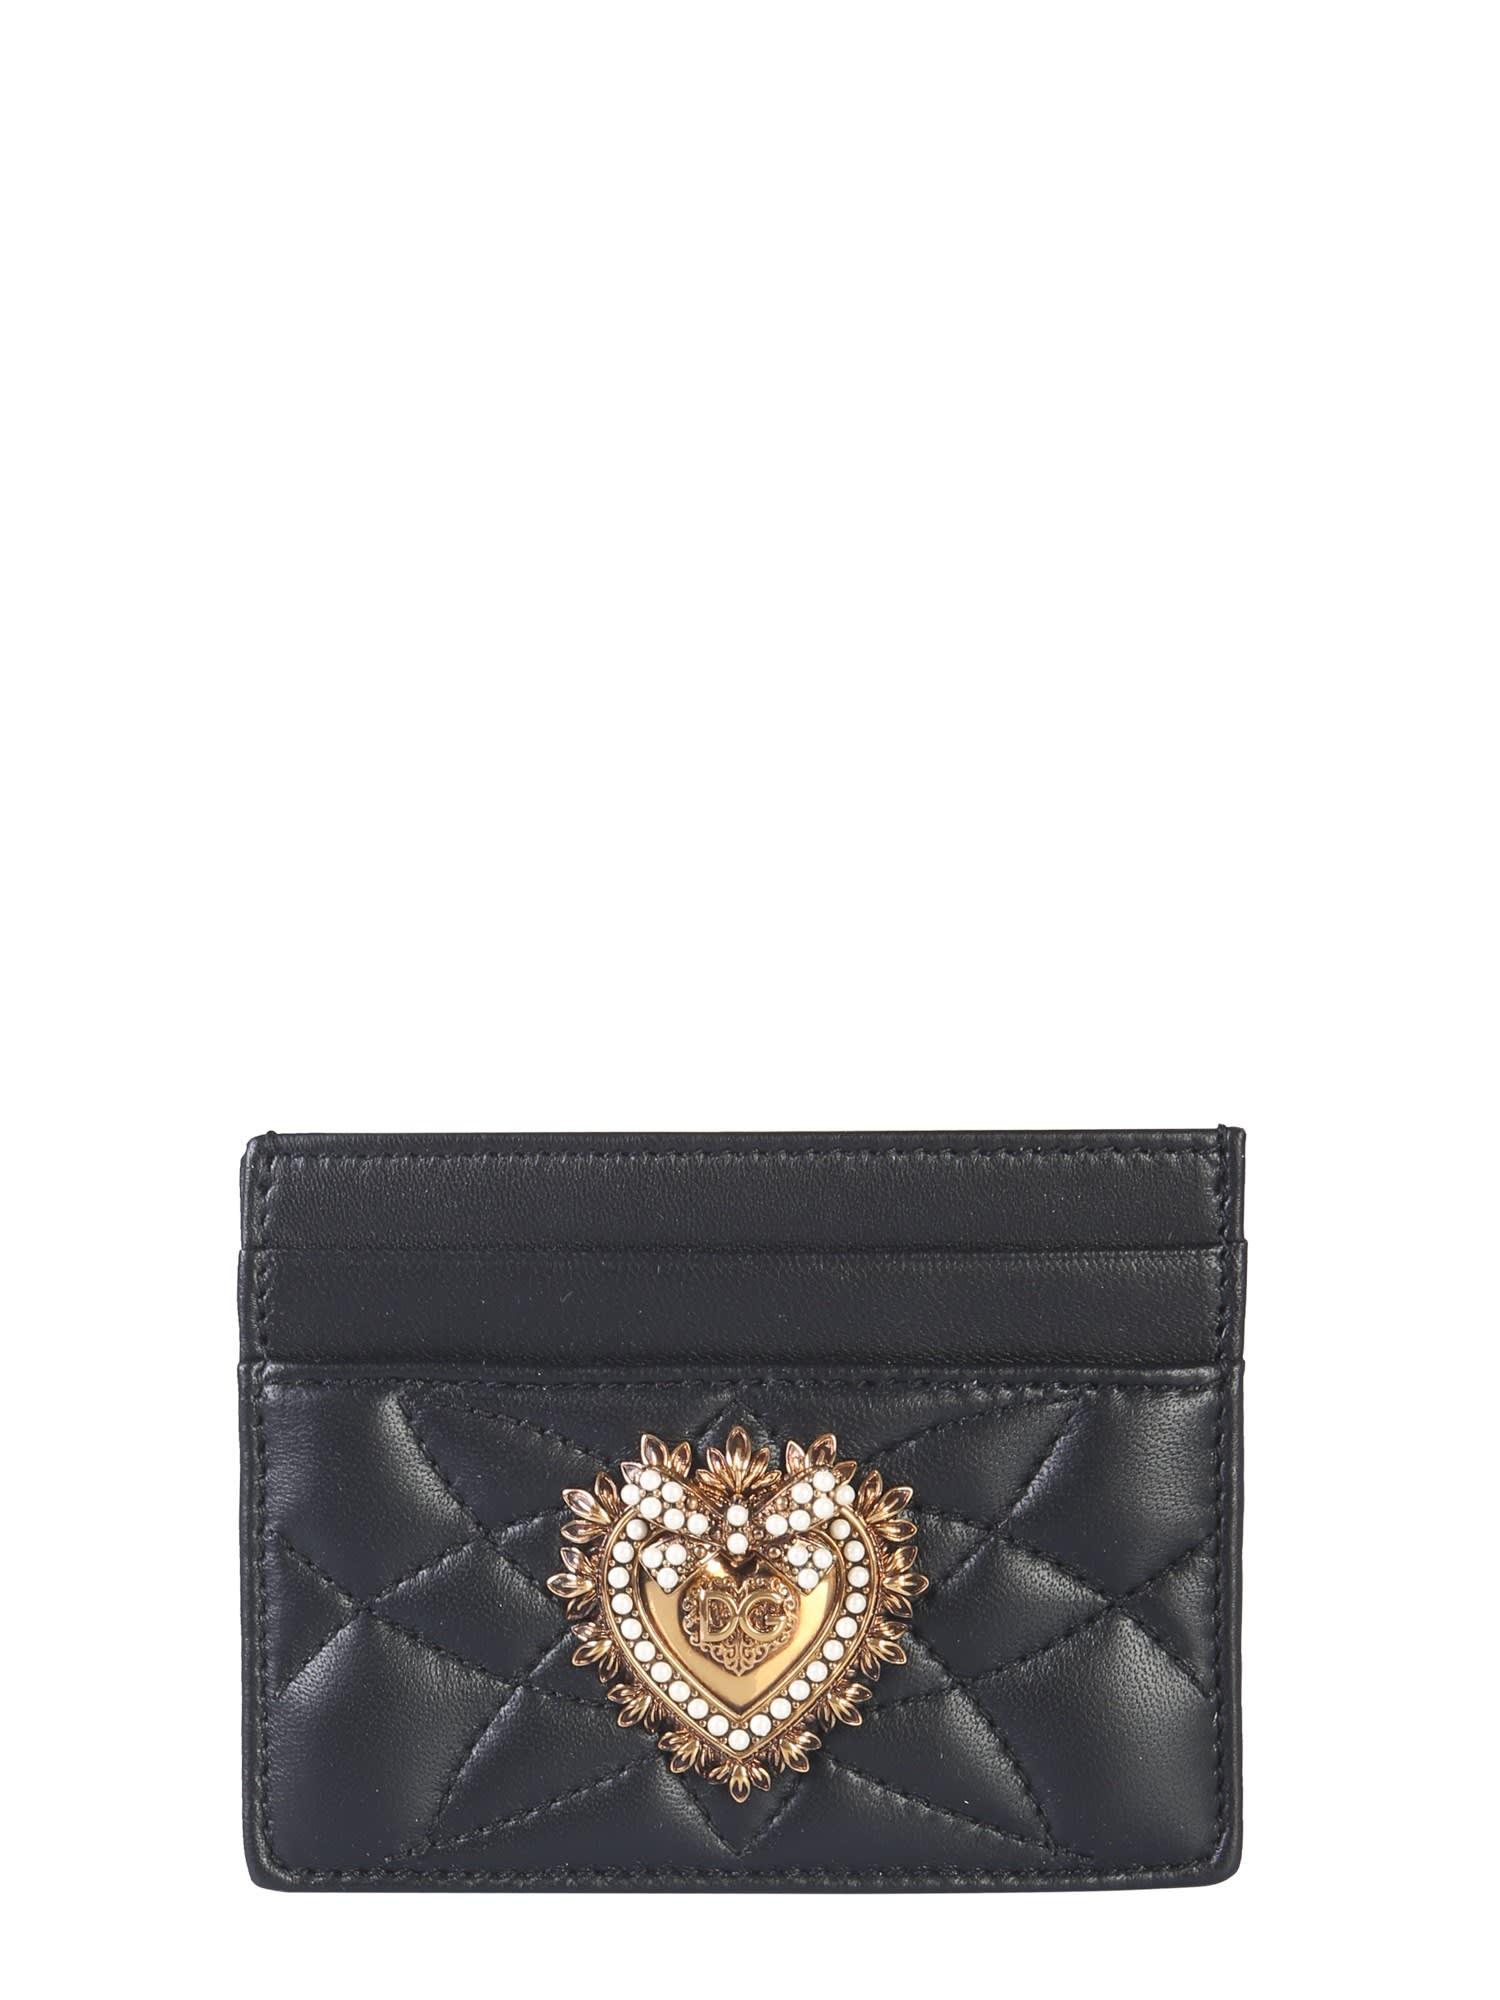 Dolce & Gabbana Cardholders DEVOTION MATE CARD HOLDER